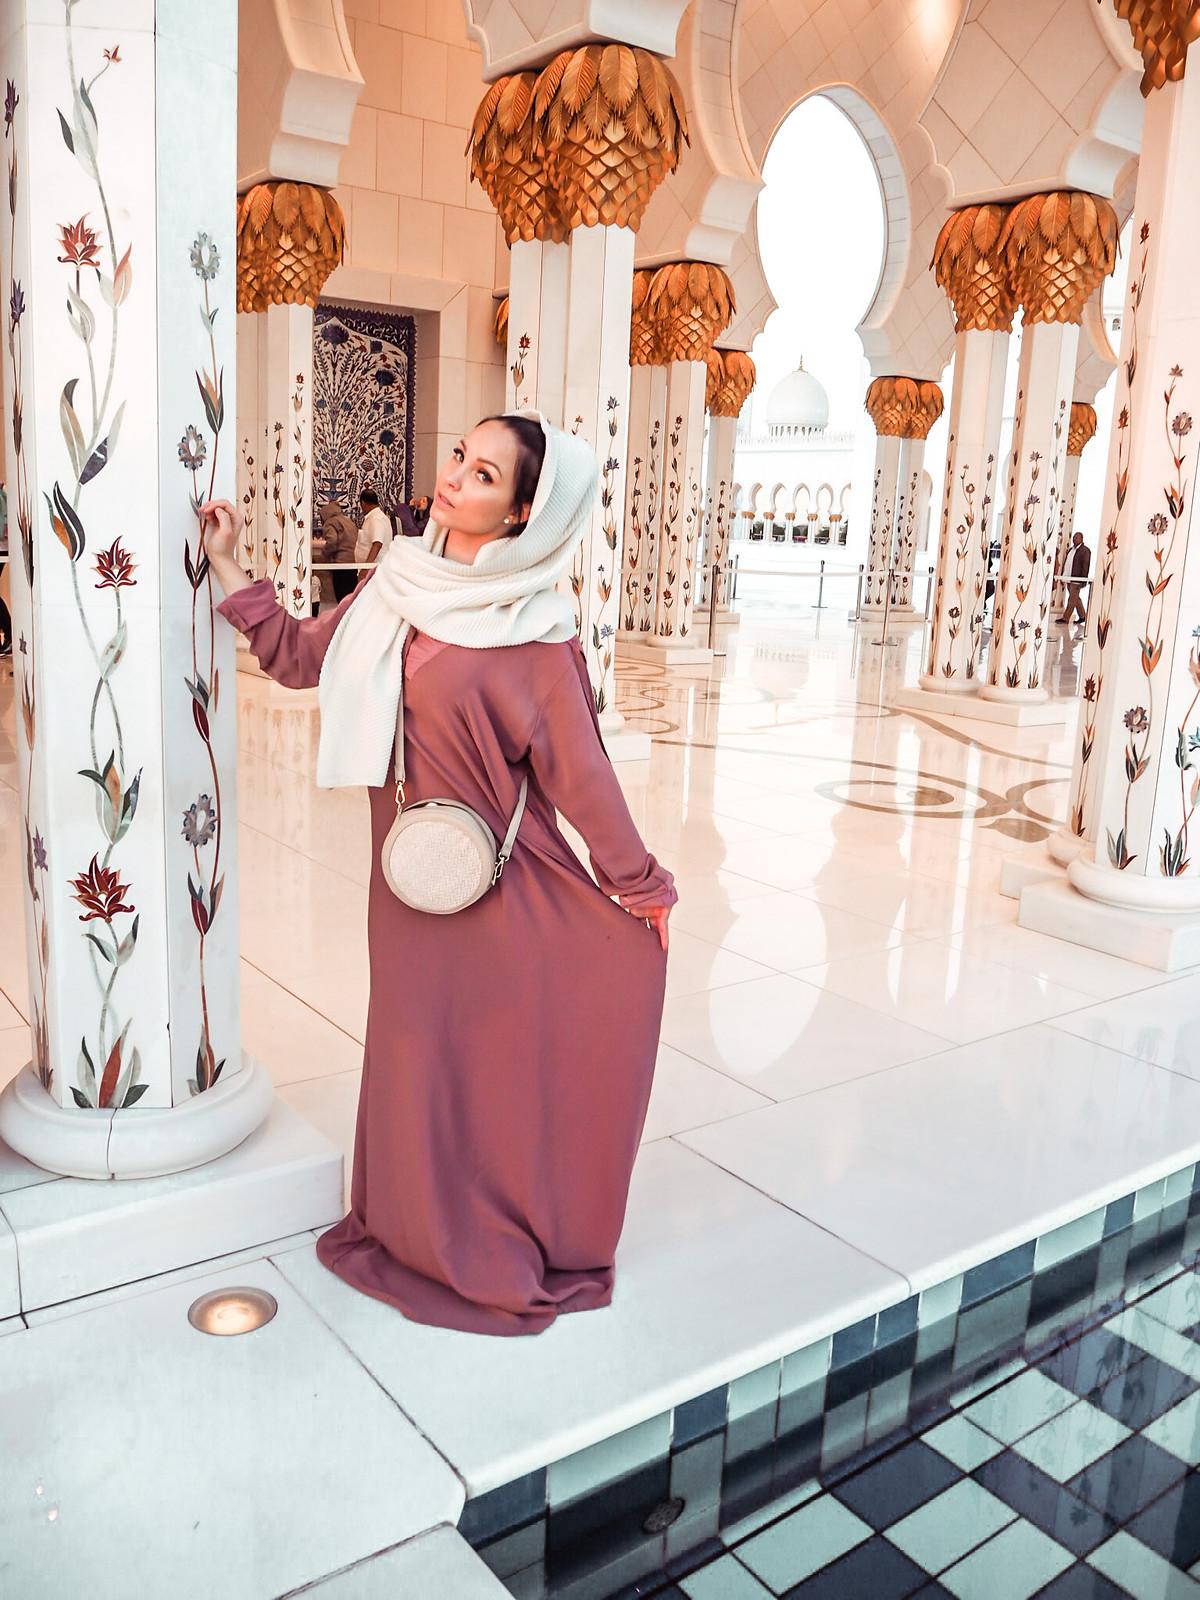 Sheikh Zayed Grand Mosque pukeutuminen